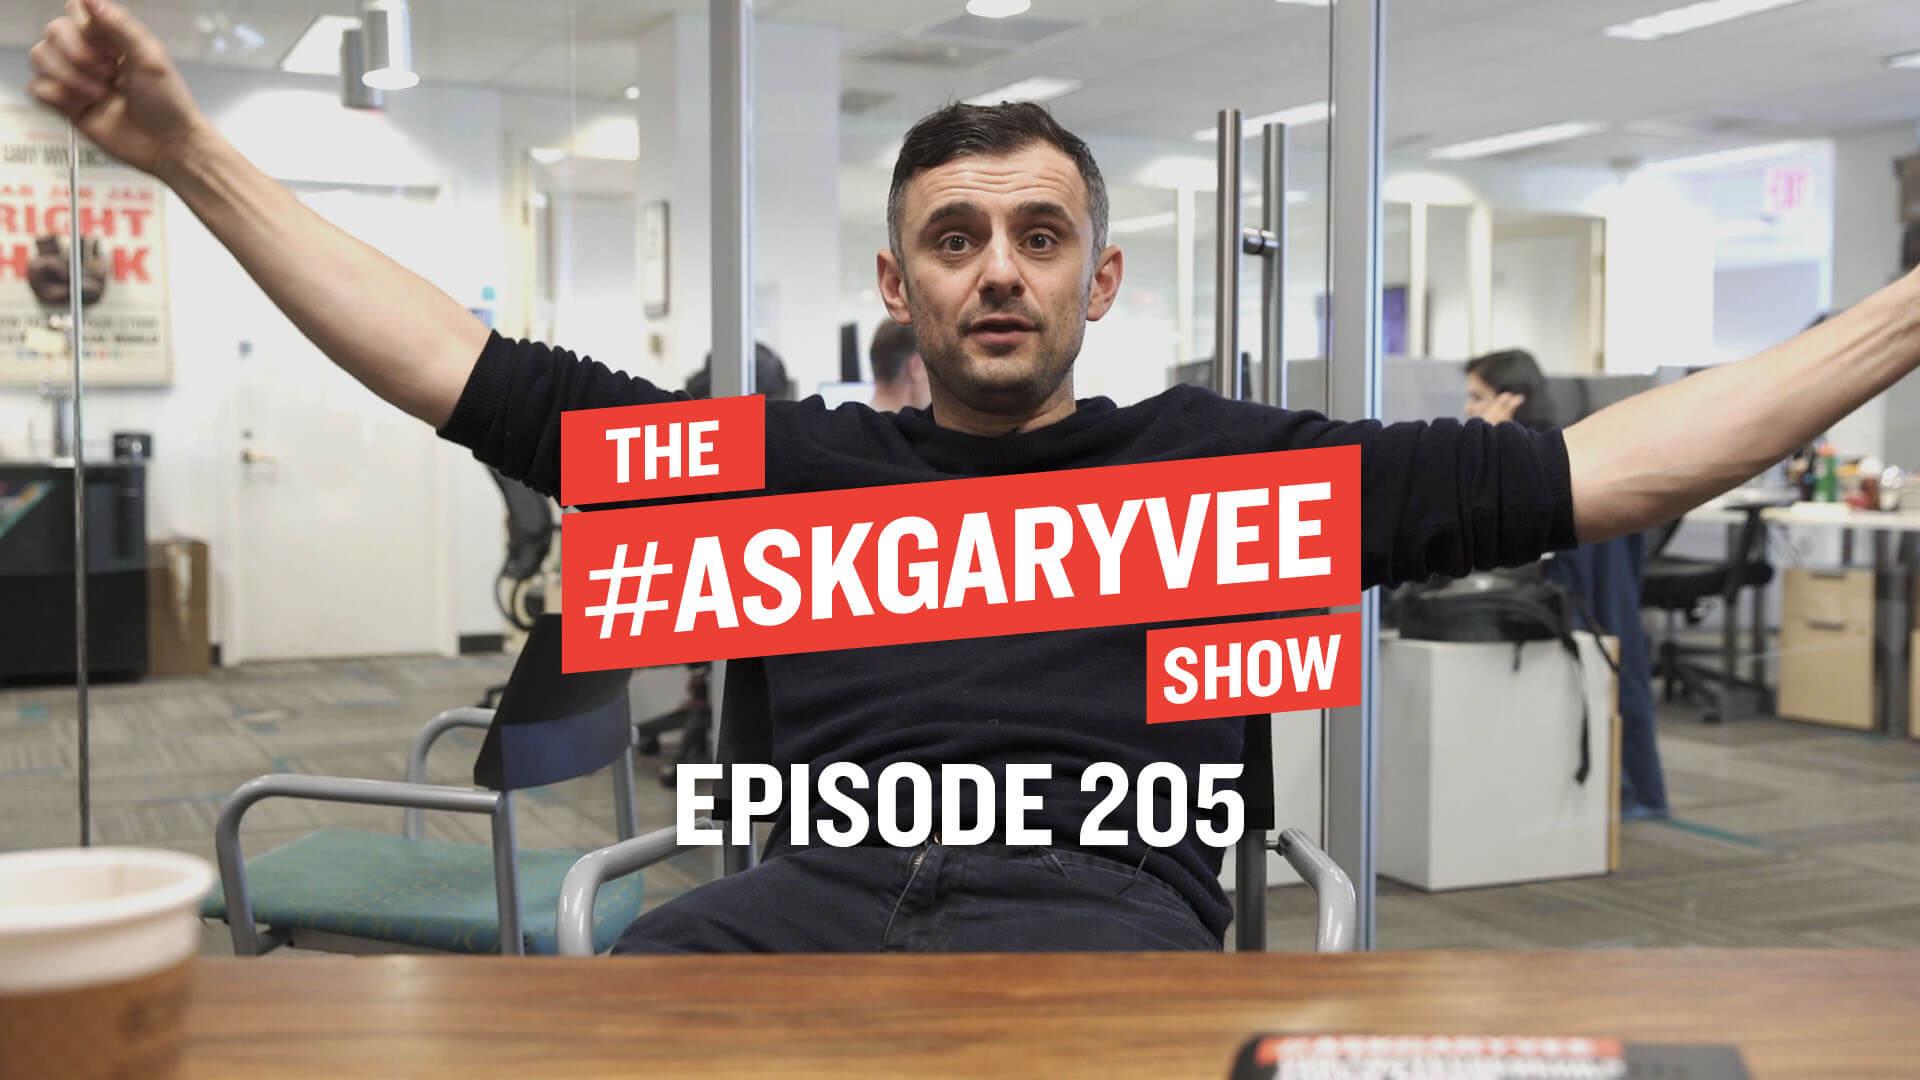 garyvee show.jpg